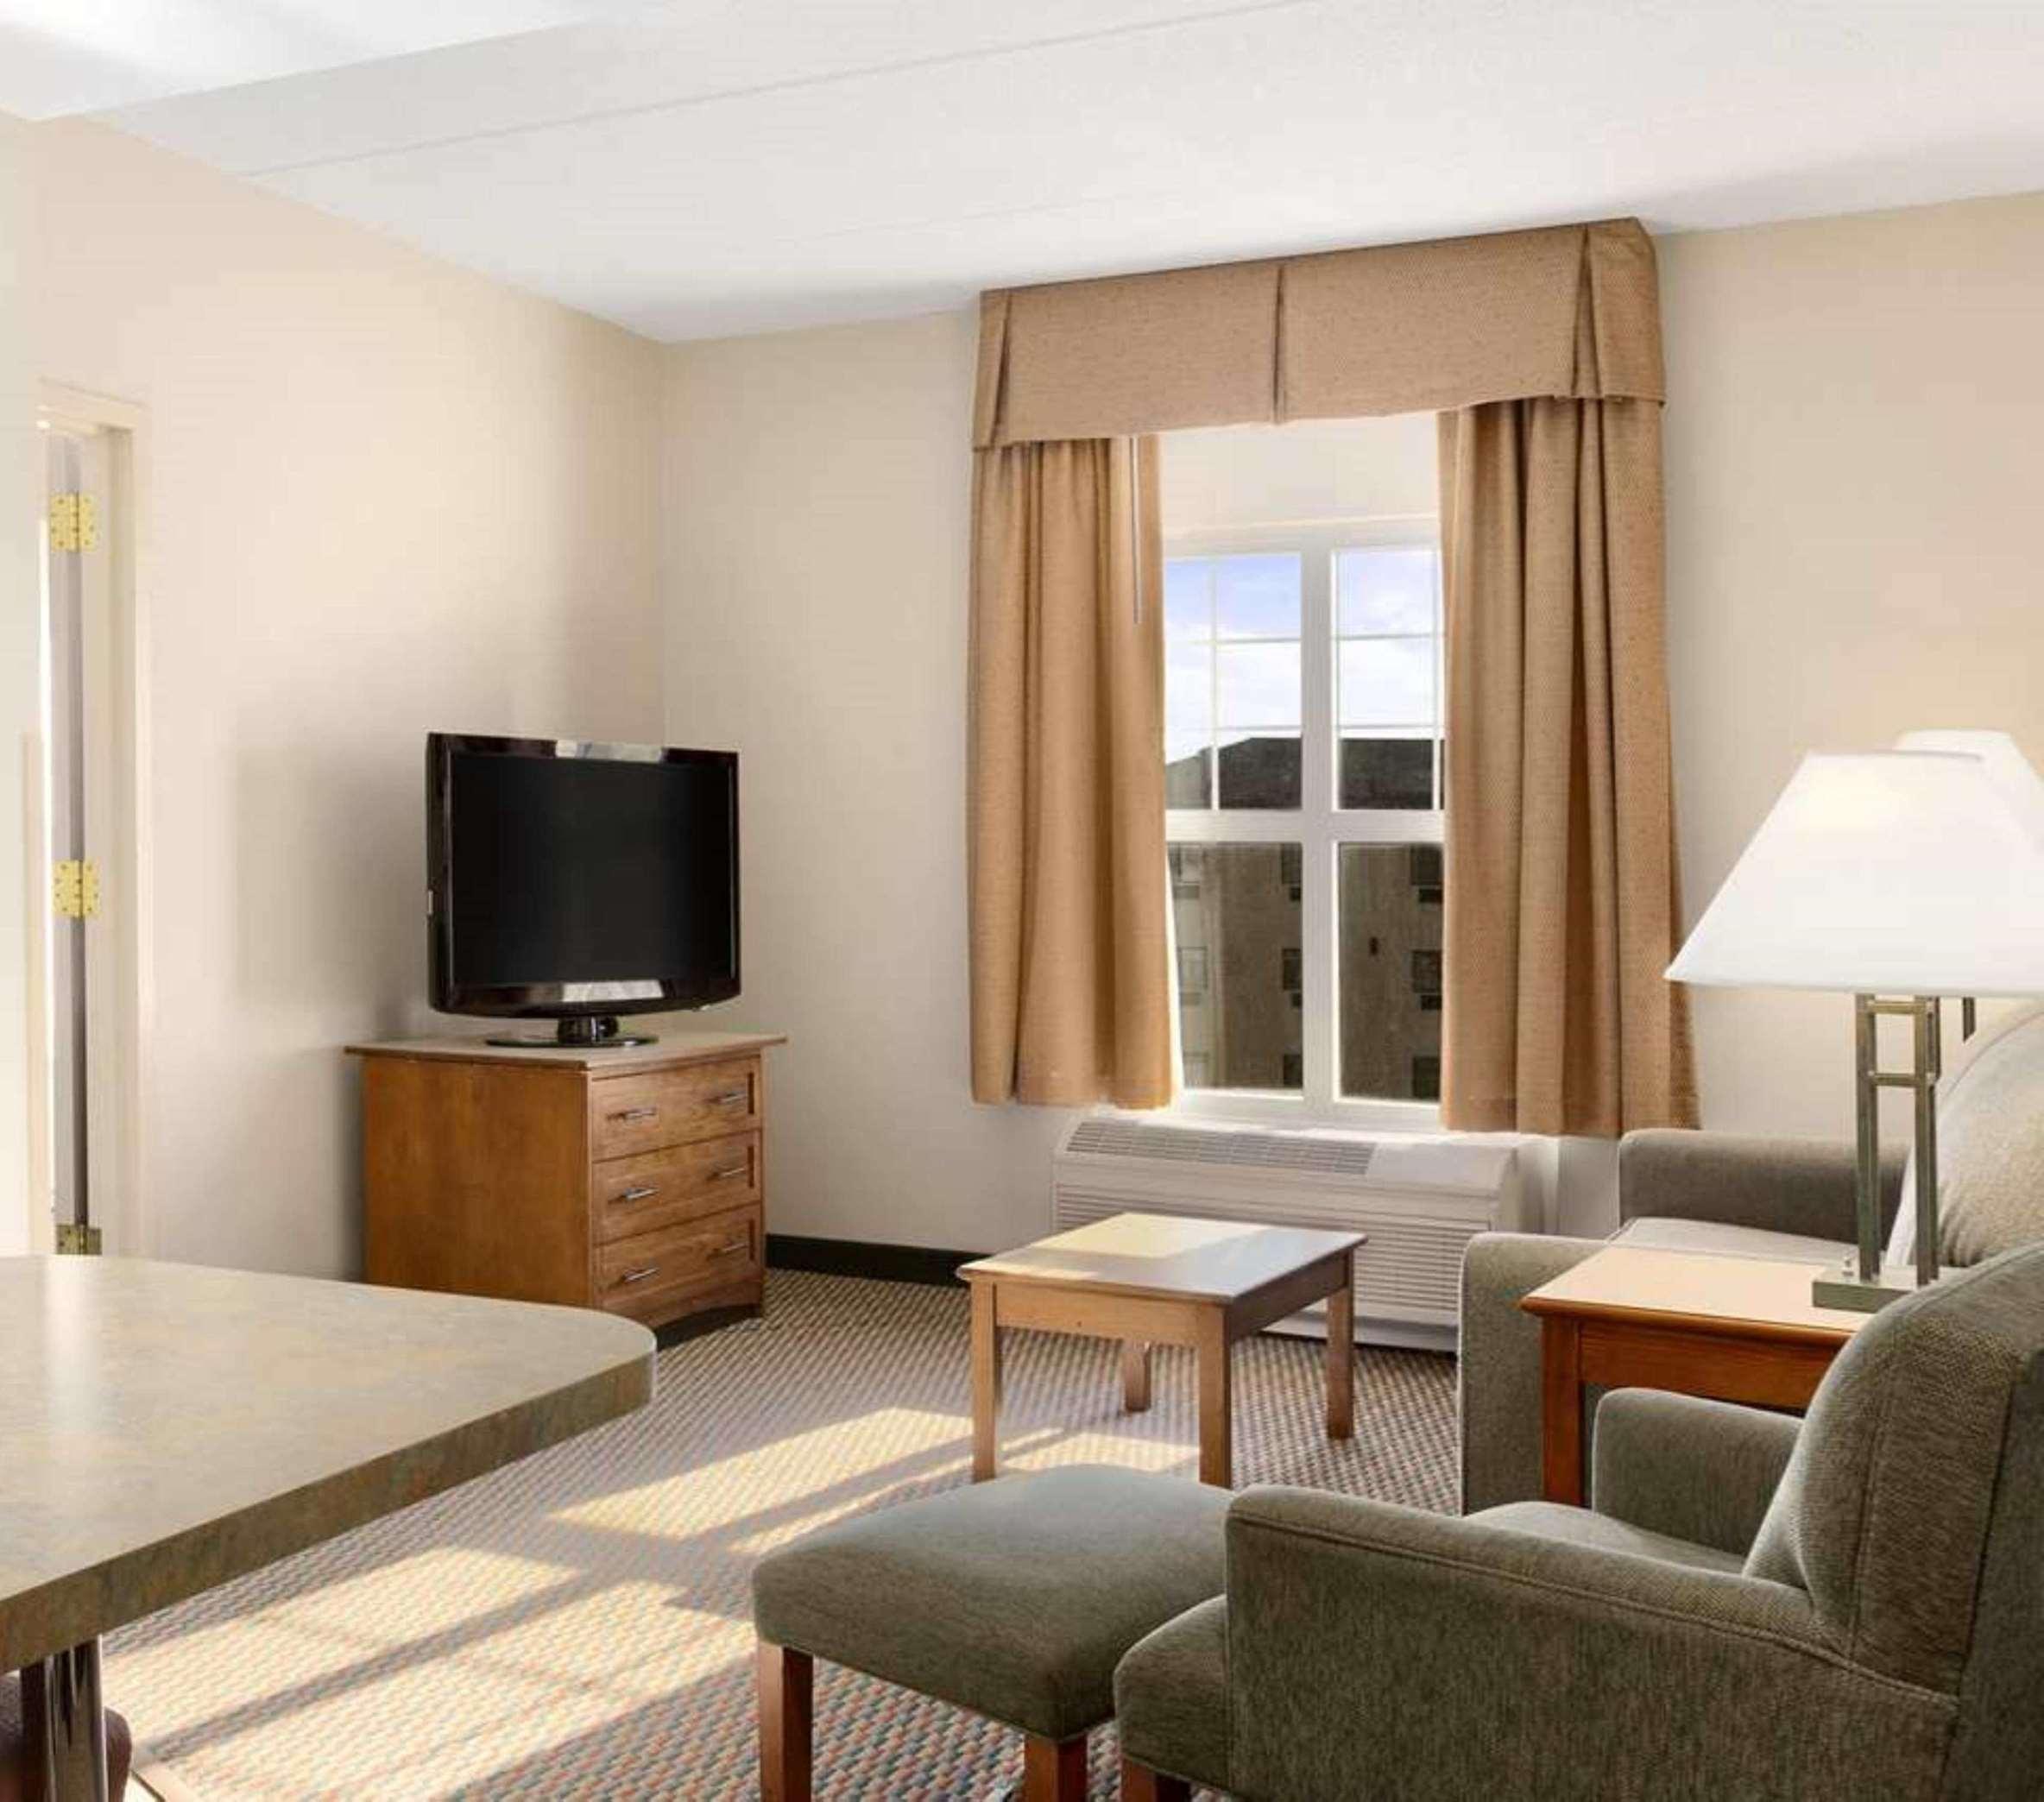 Hampton Inn & Suites Providence/Warwick-Airport image 36